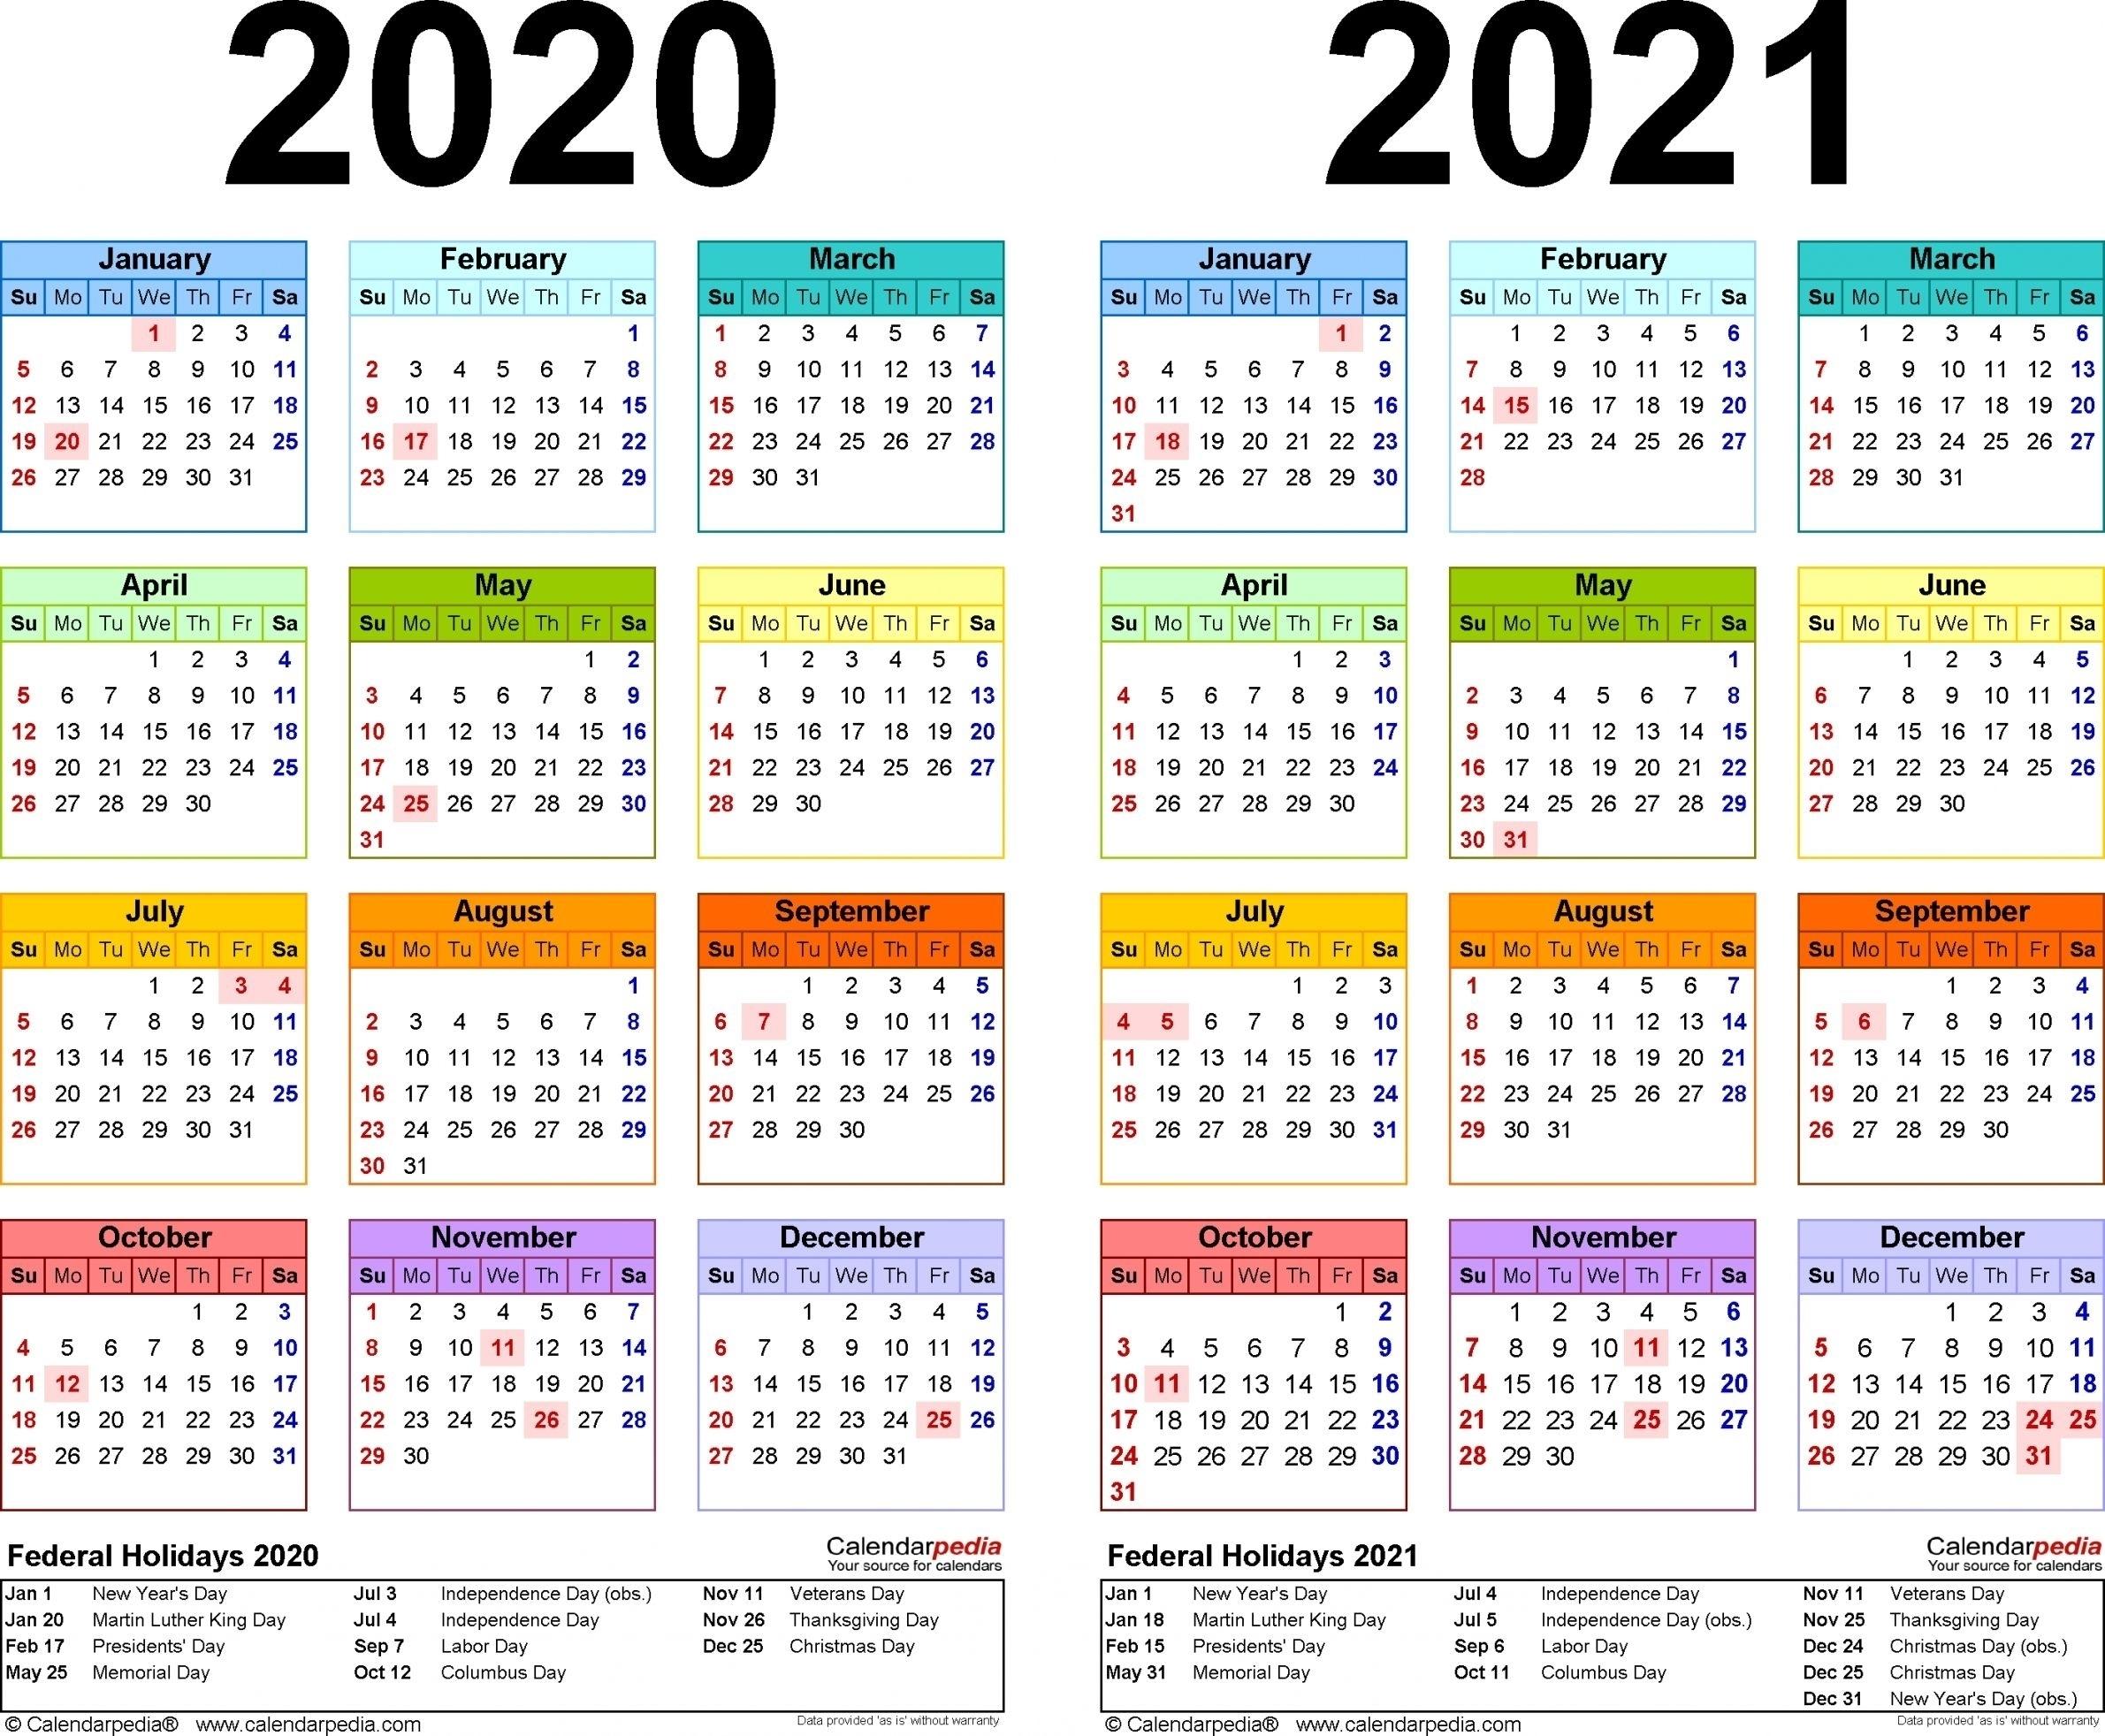 2021 2020 School Year Calendar Template | Avnitasoni